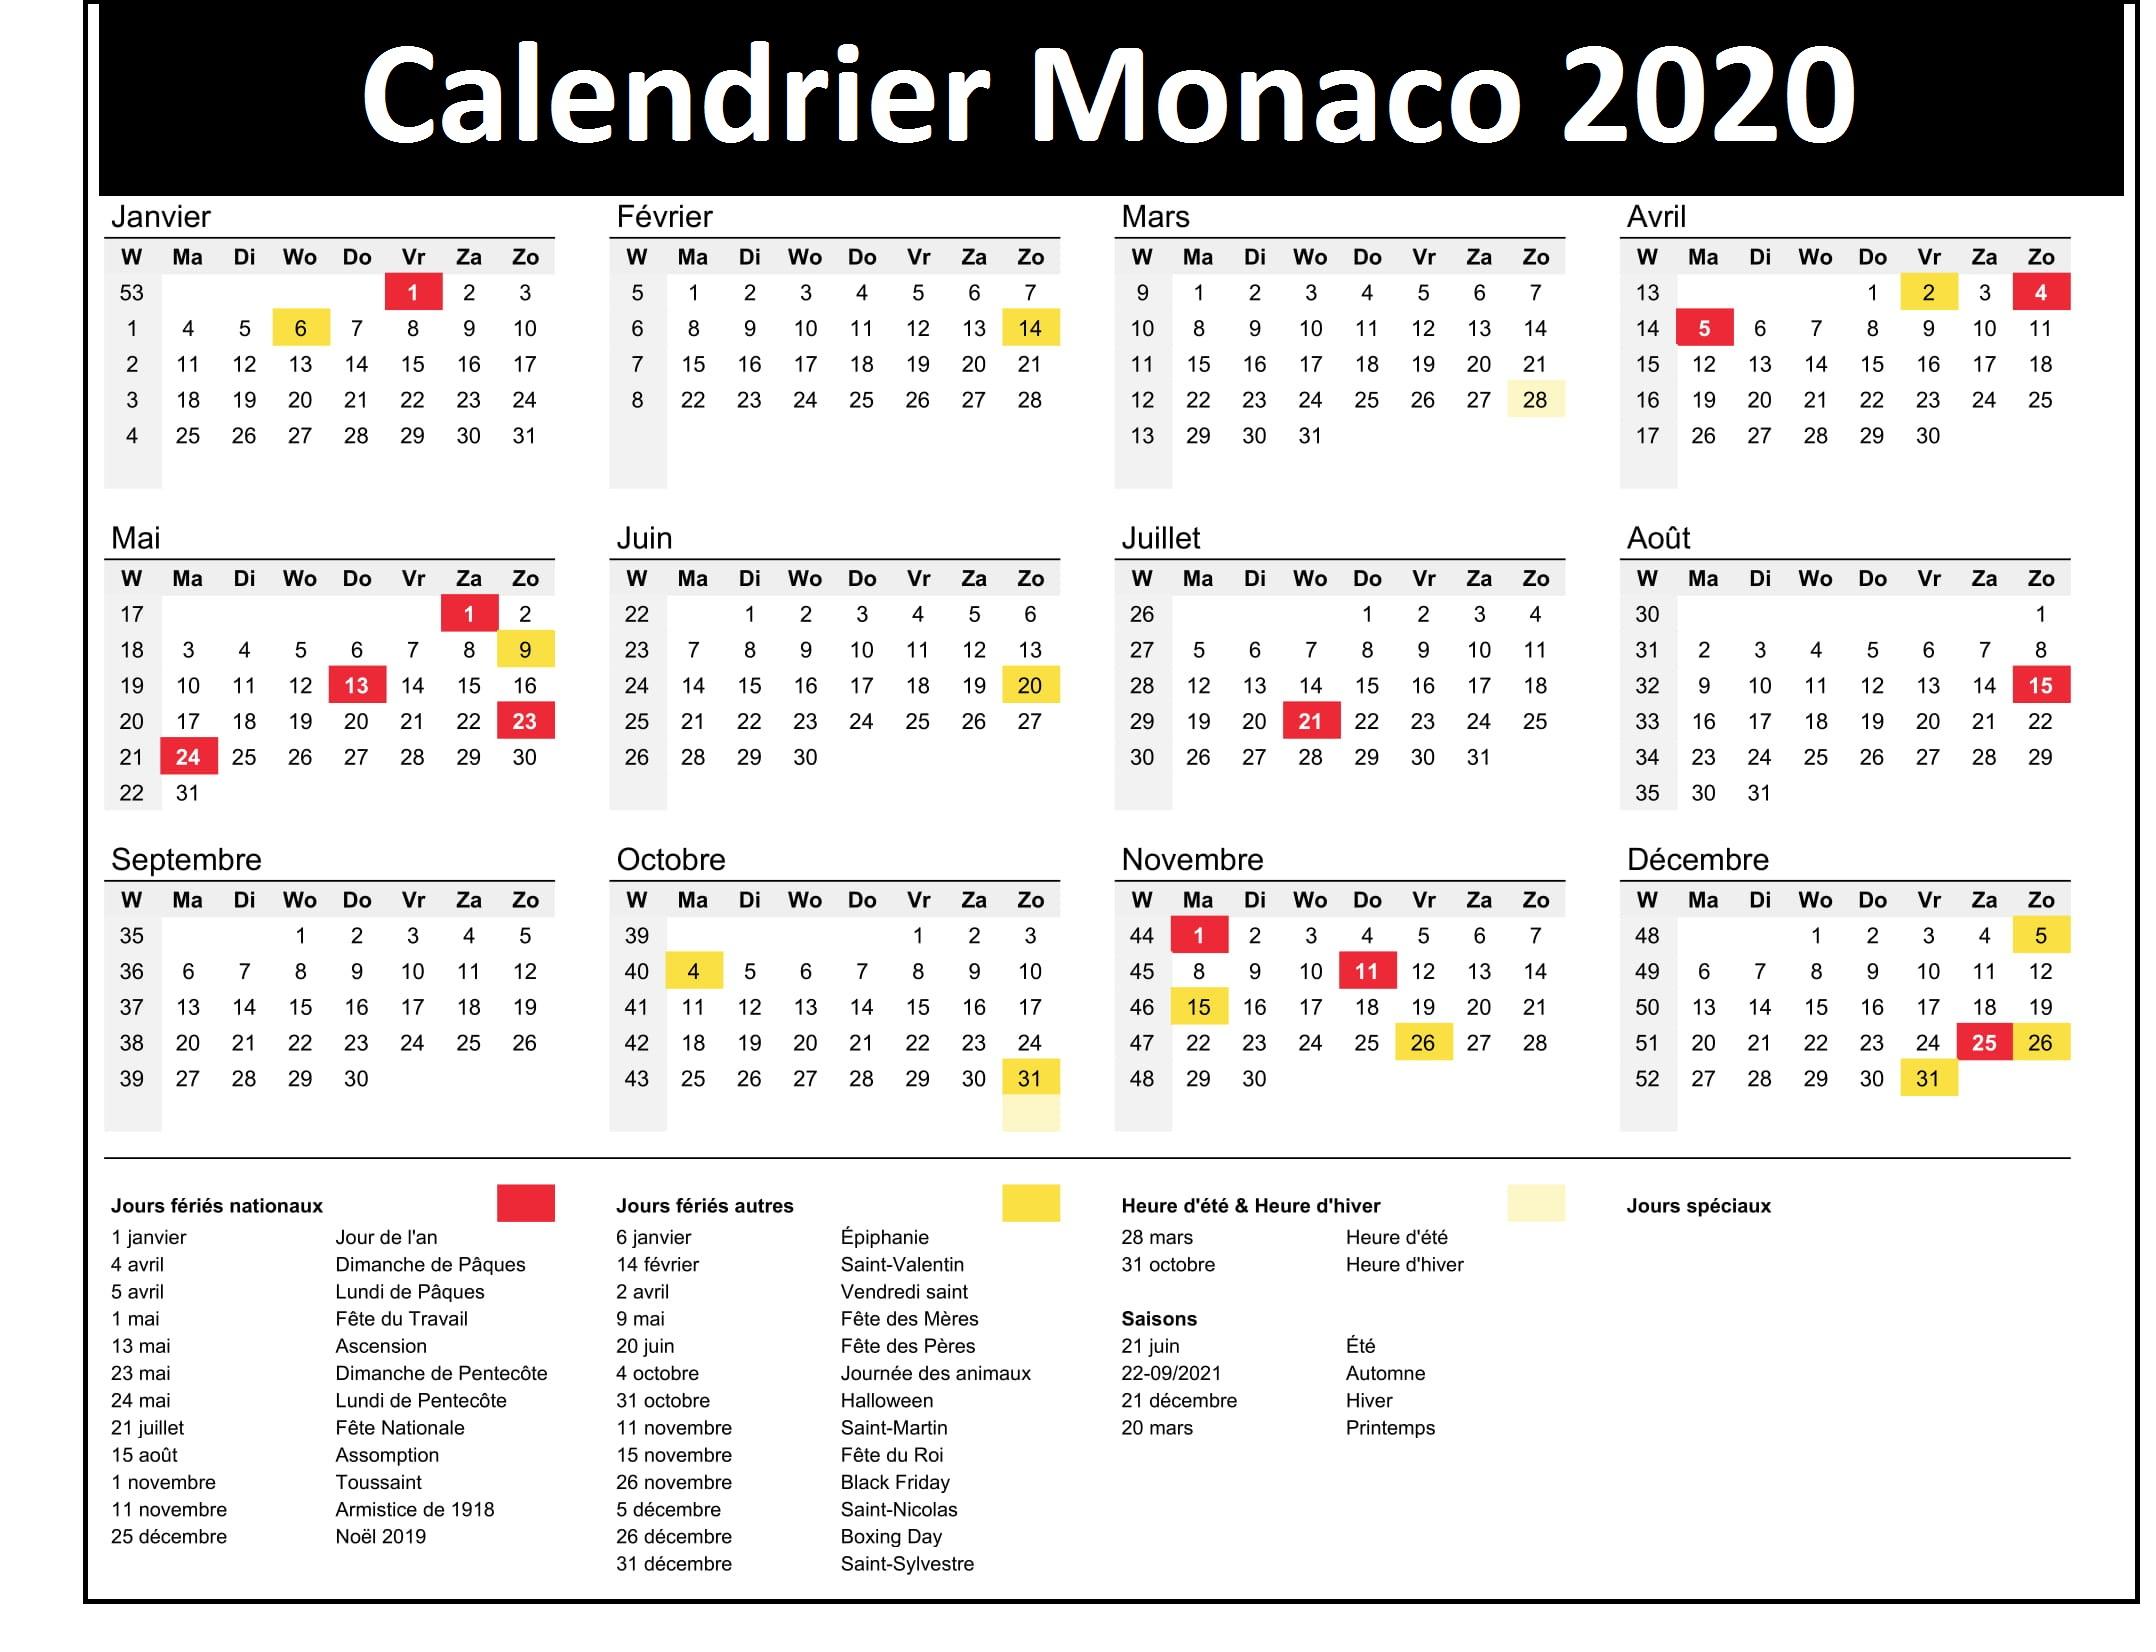 Calendrier Vacances Scolaire Monaco 2020